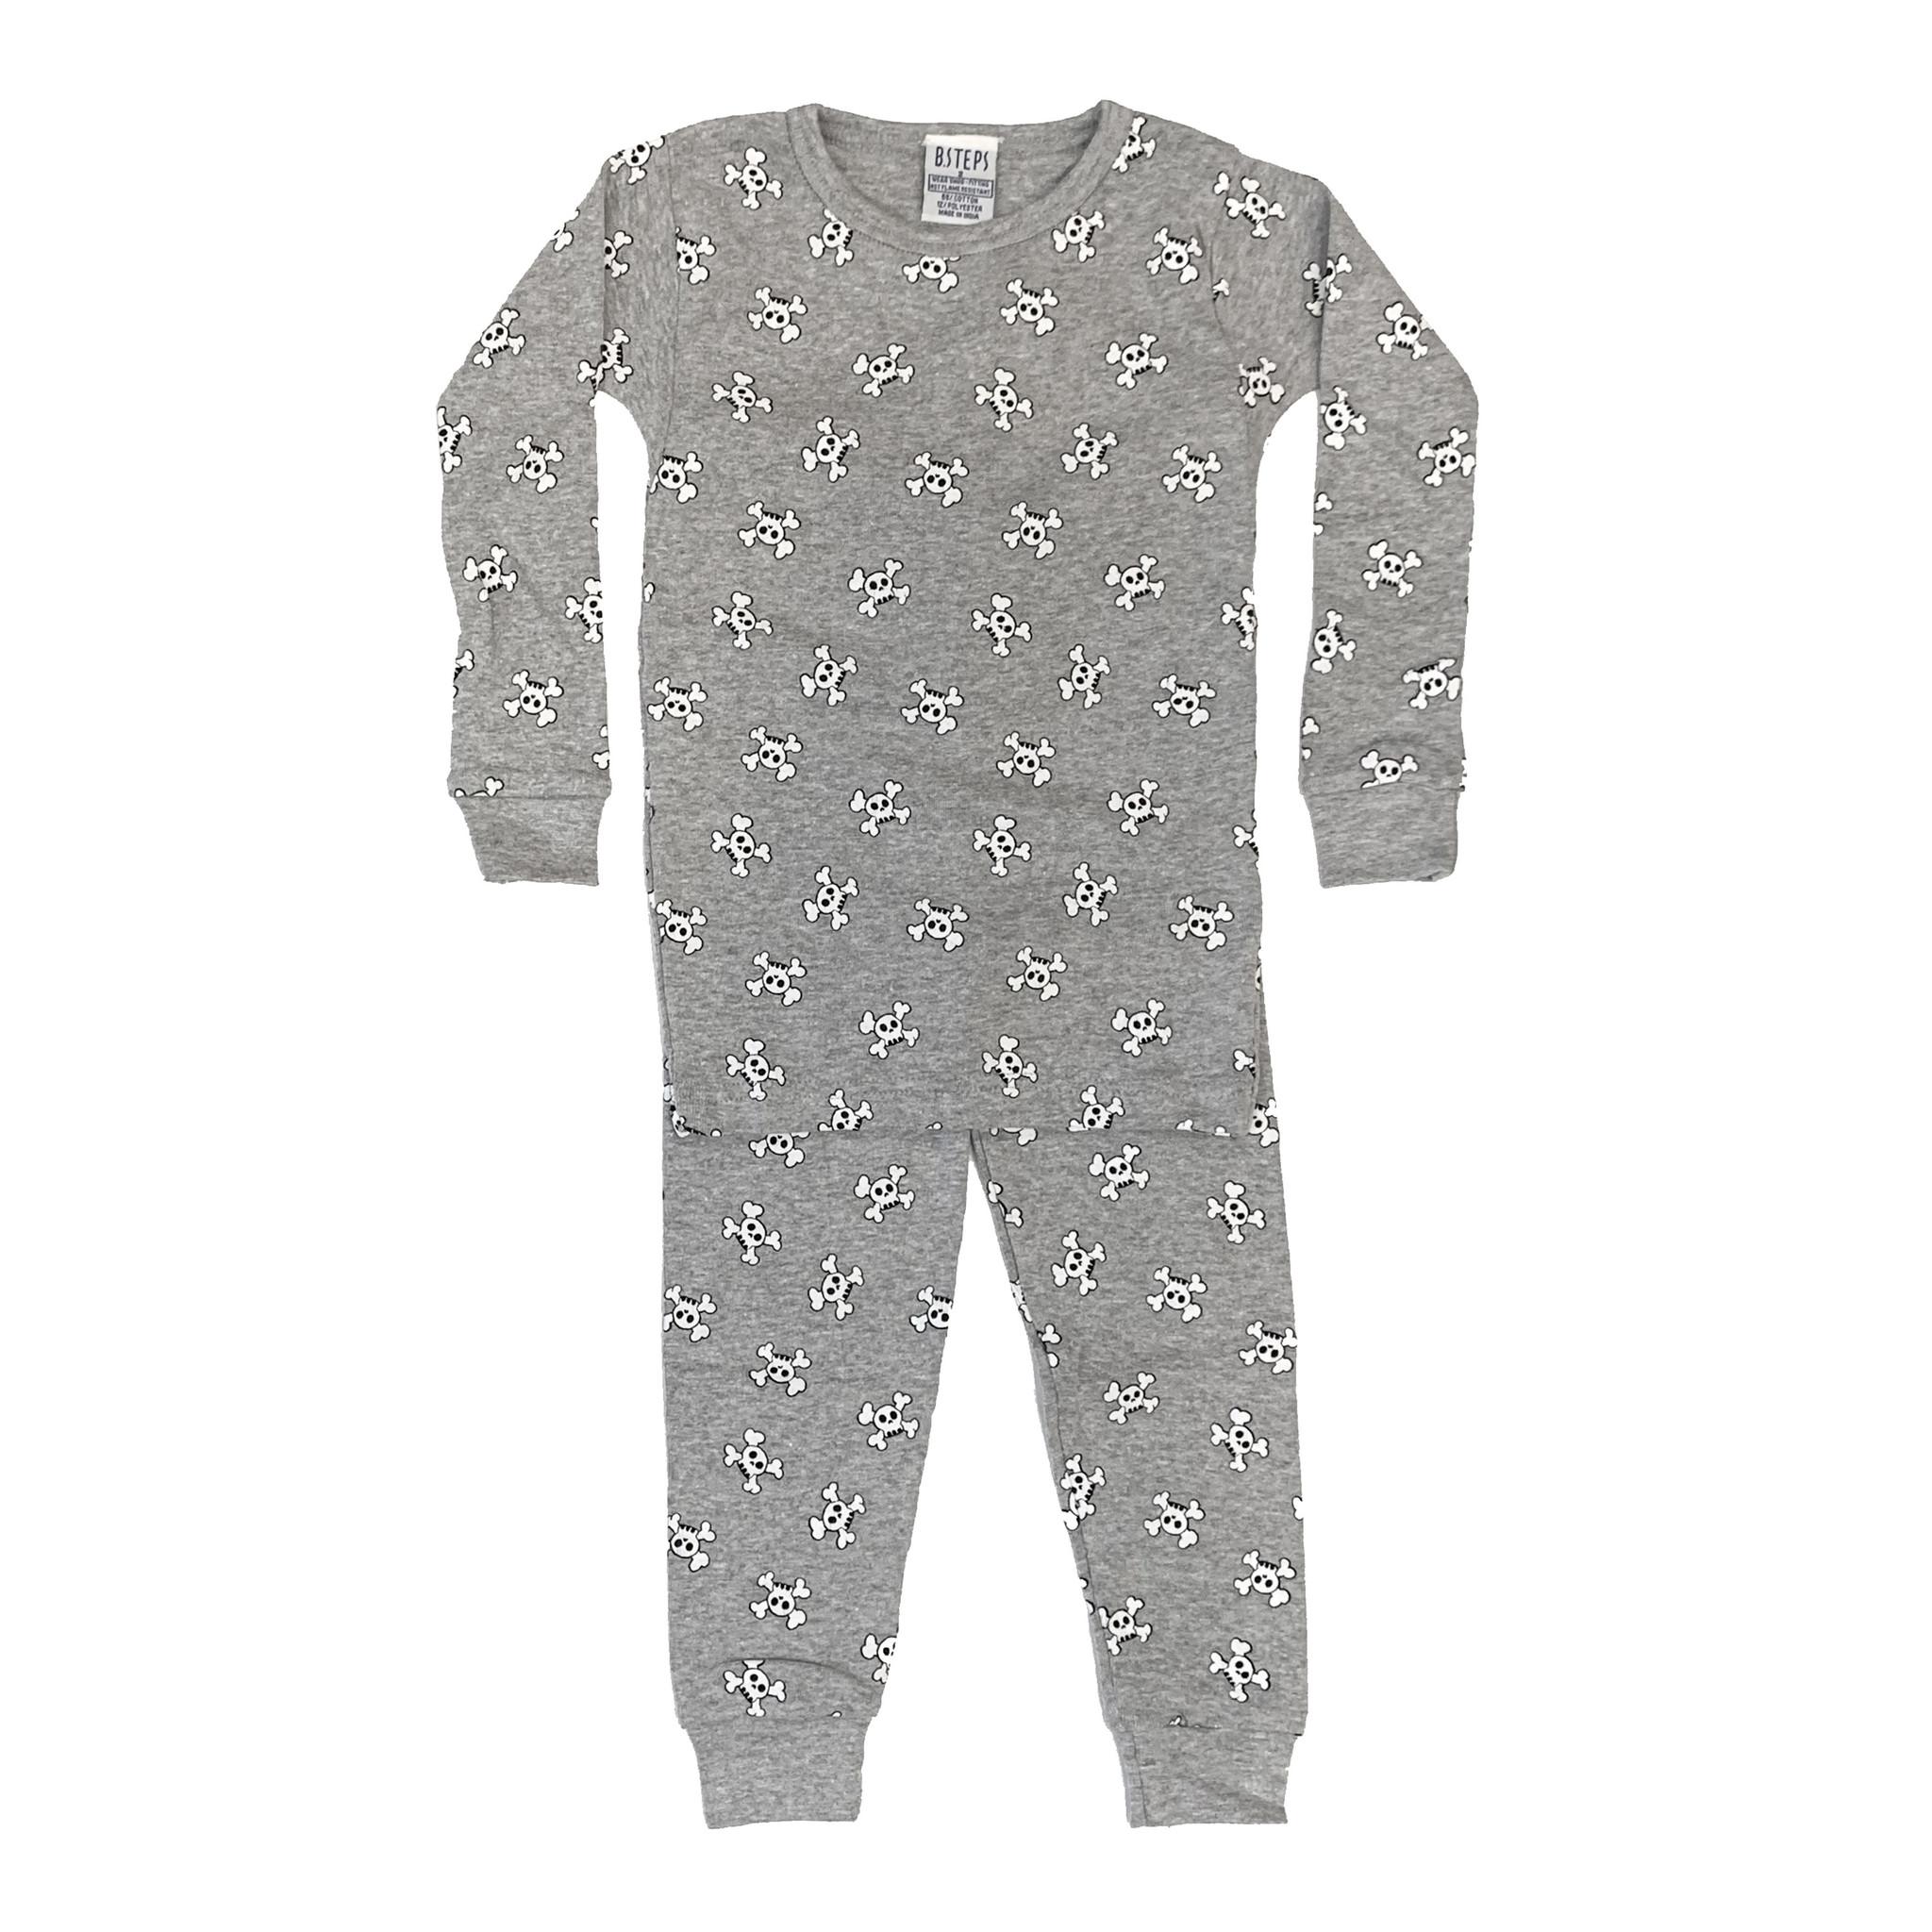 Baby Steps Grey Skulls PJ Set